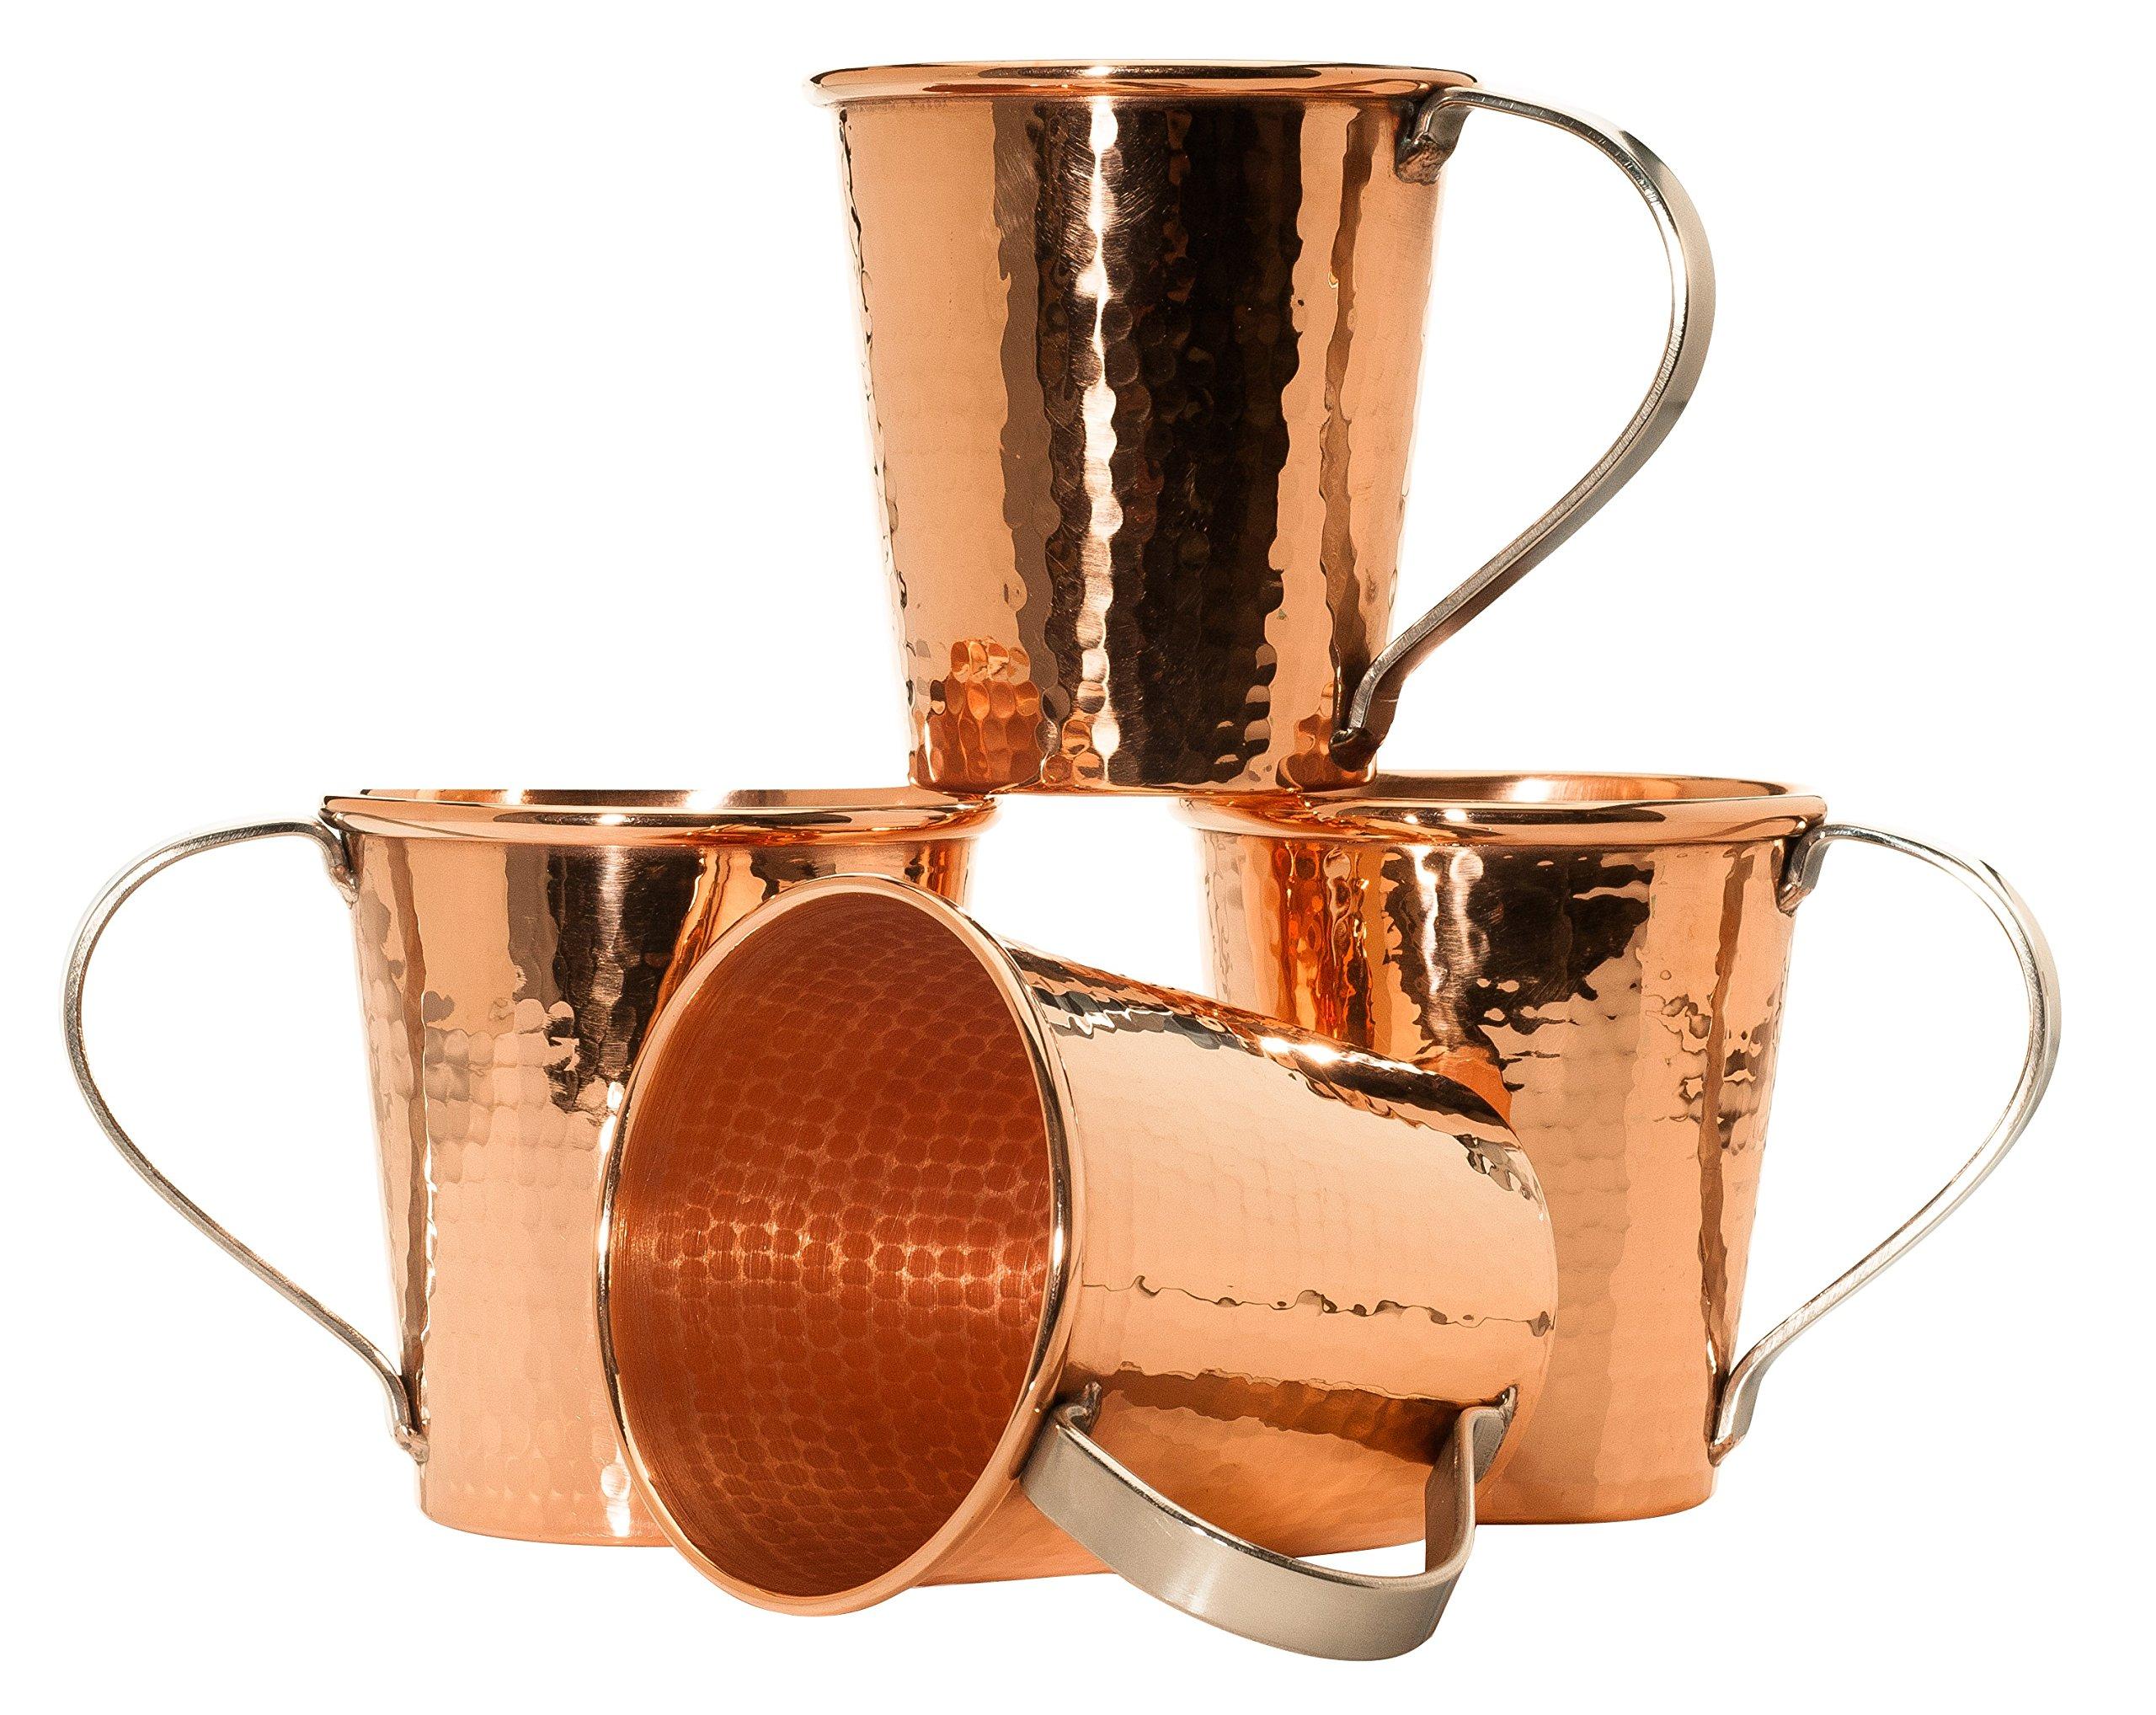 Sertodo Copper CMM-18-4 Moscow Mule Mug Set, Hand Hammered 100% Pure Copper, 18 oz, Set of 4 by Sertodo Copper